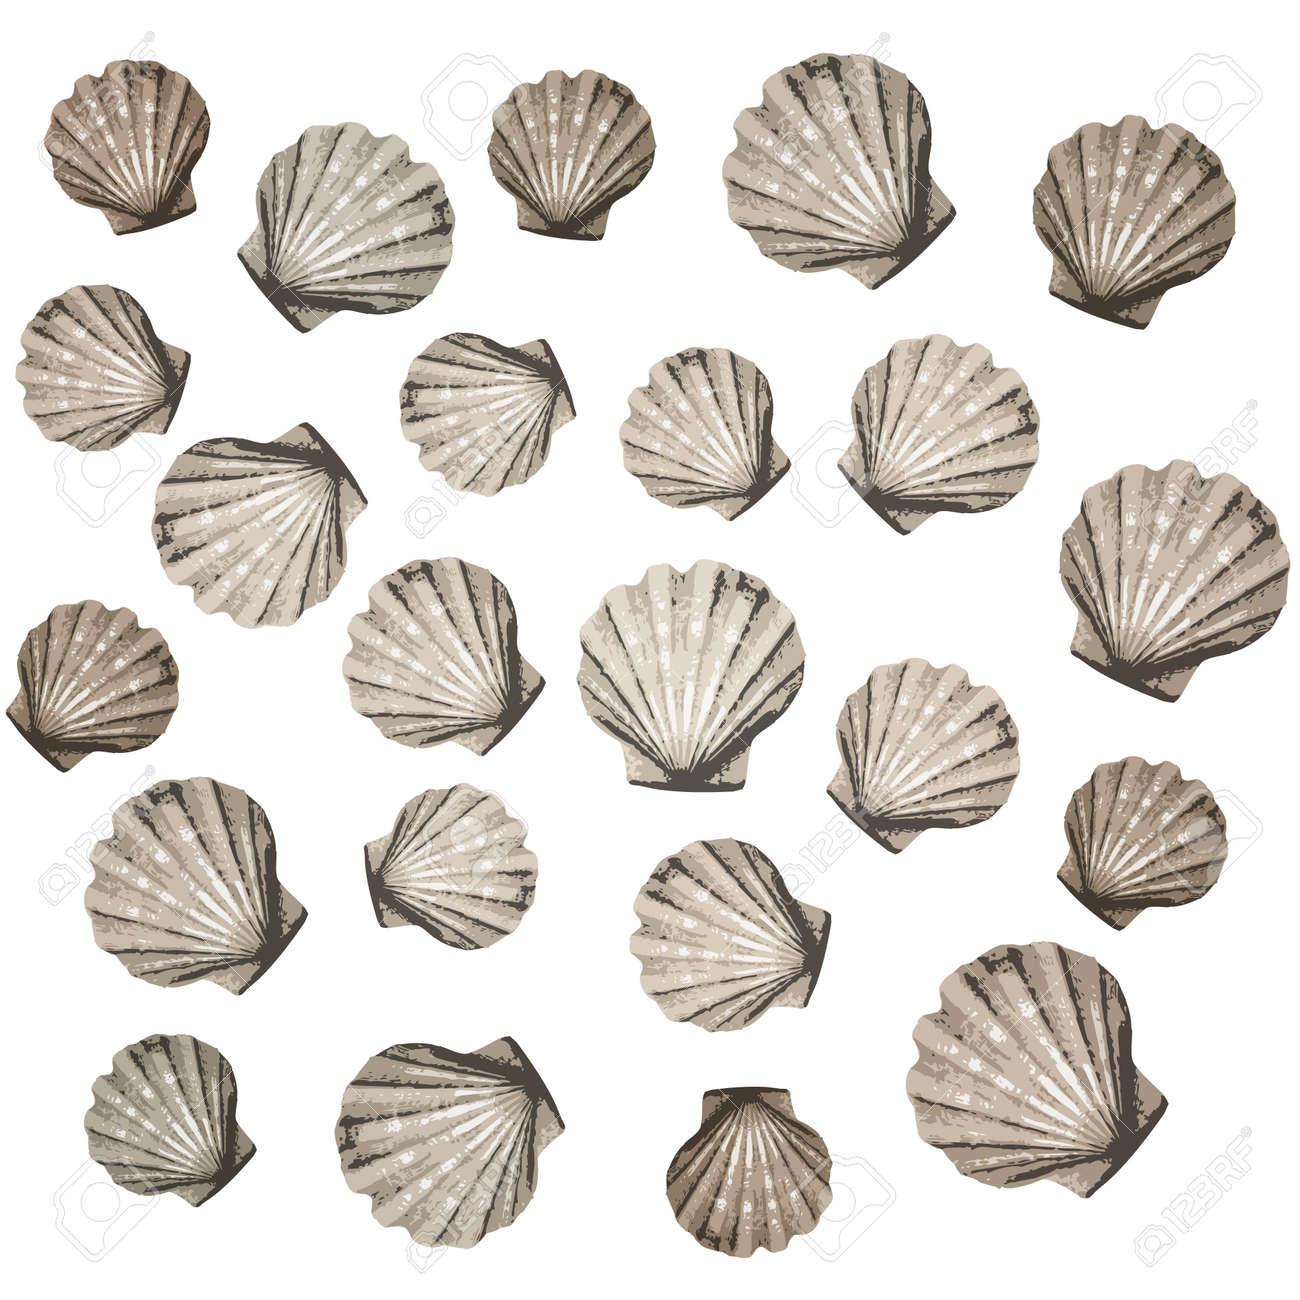 shells background Stock Vector - 10590563